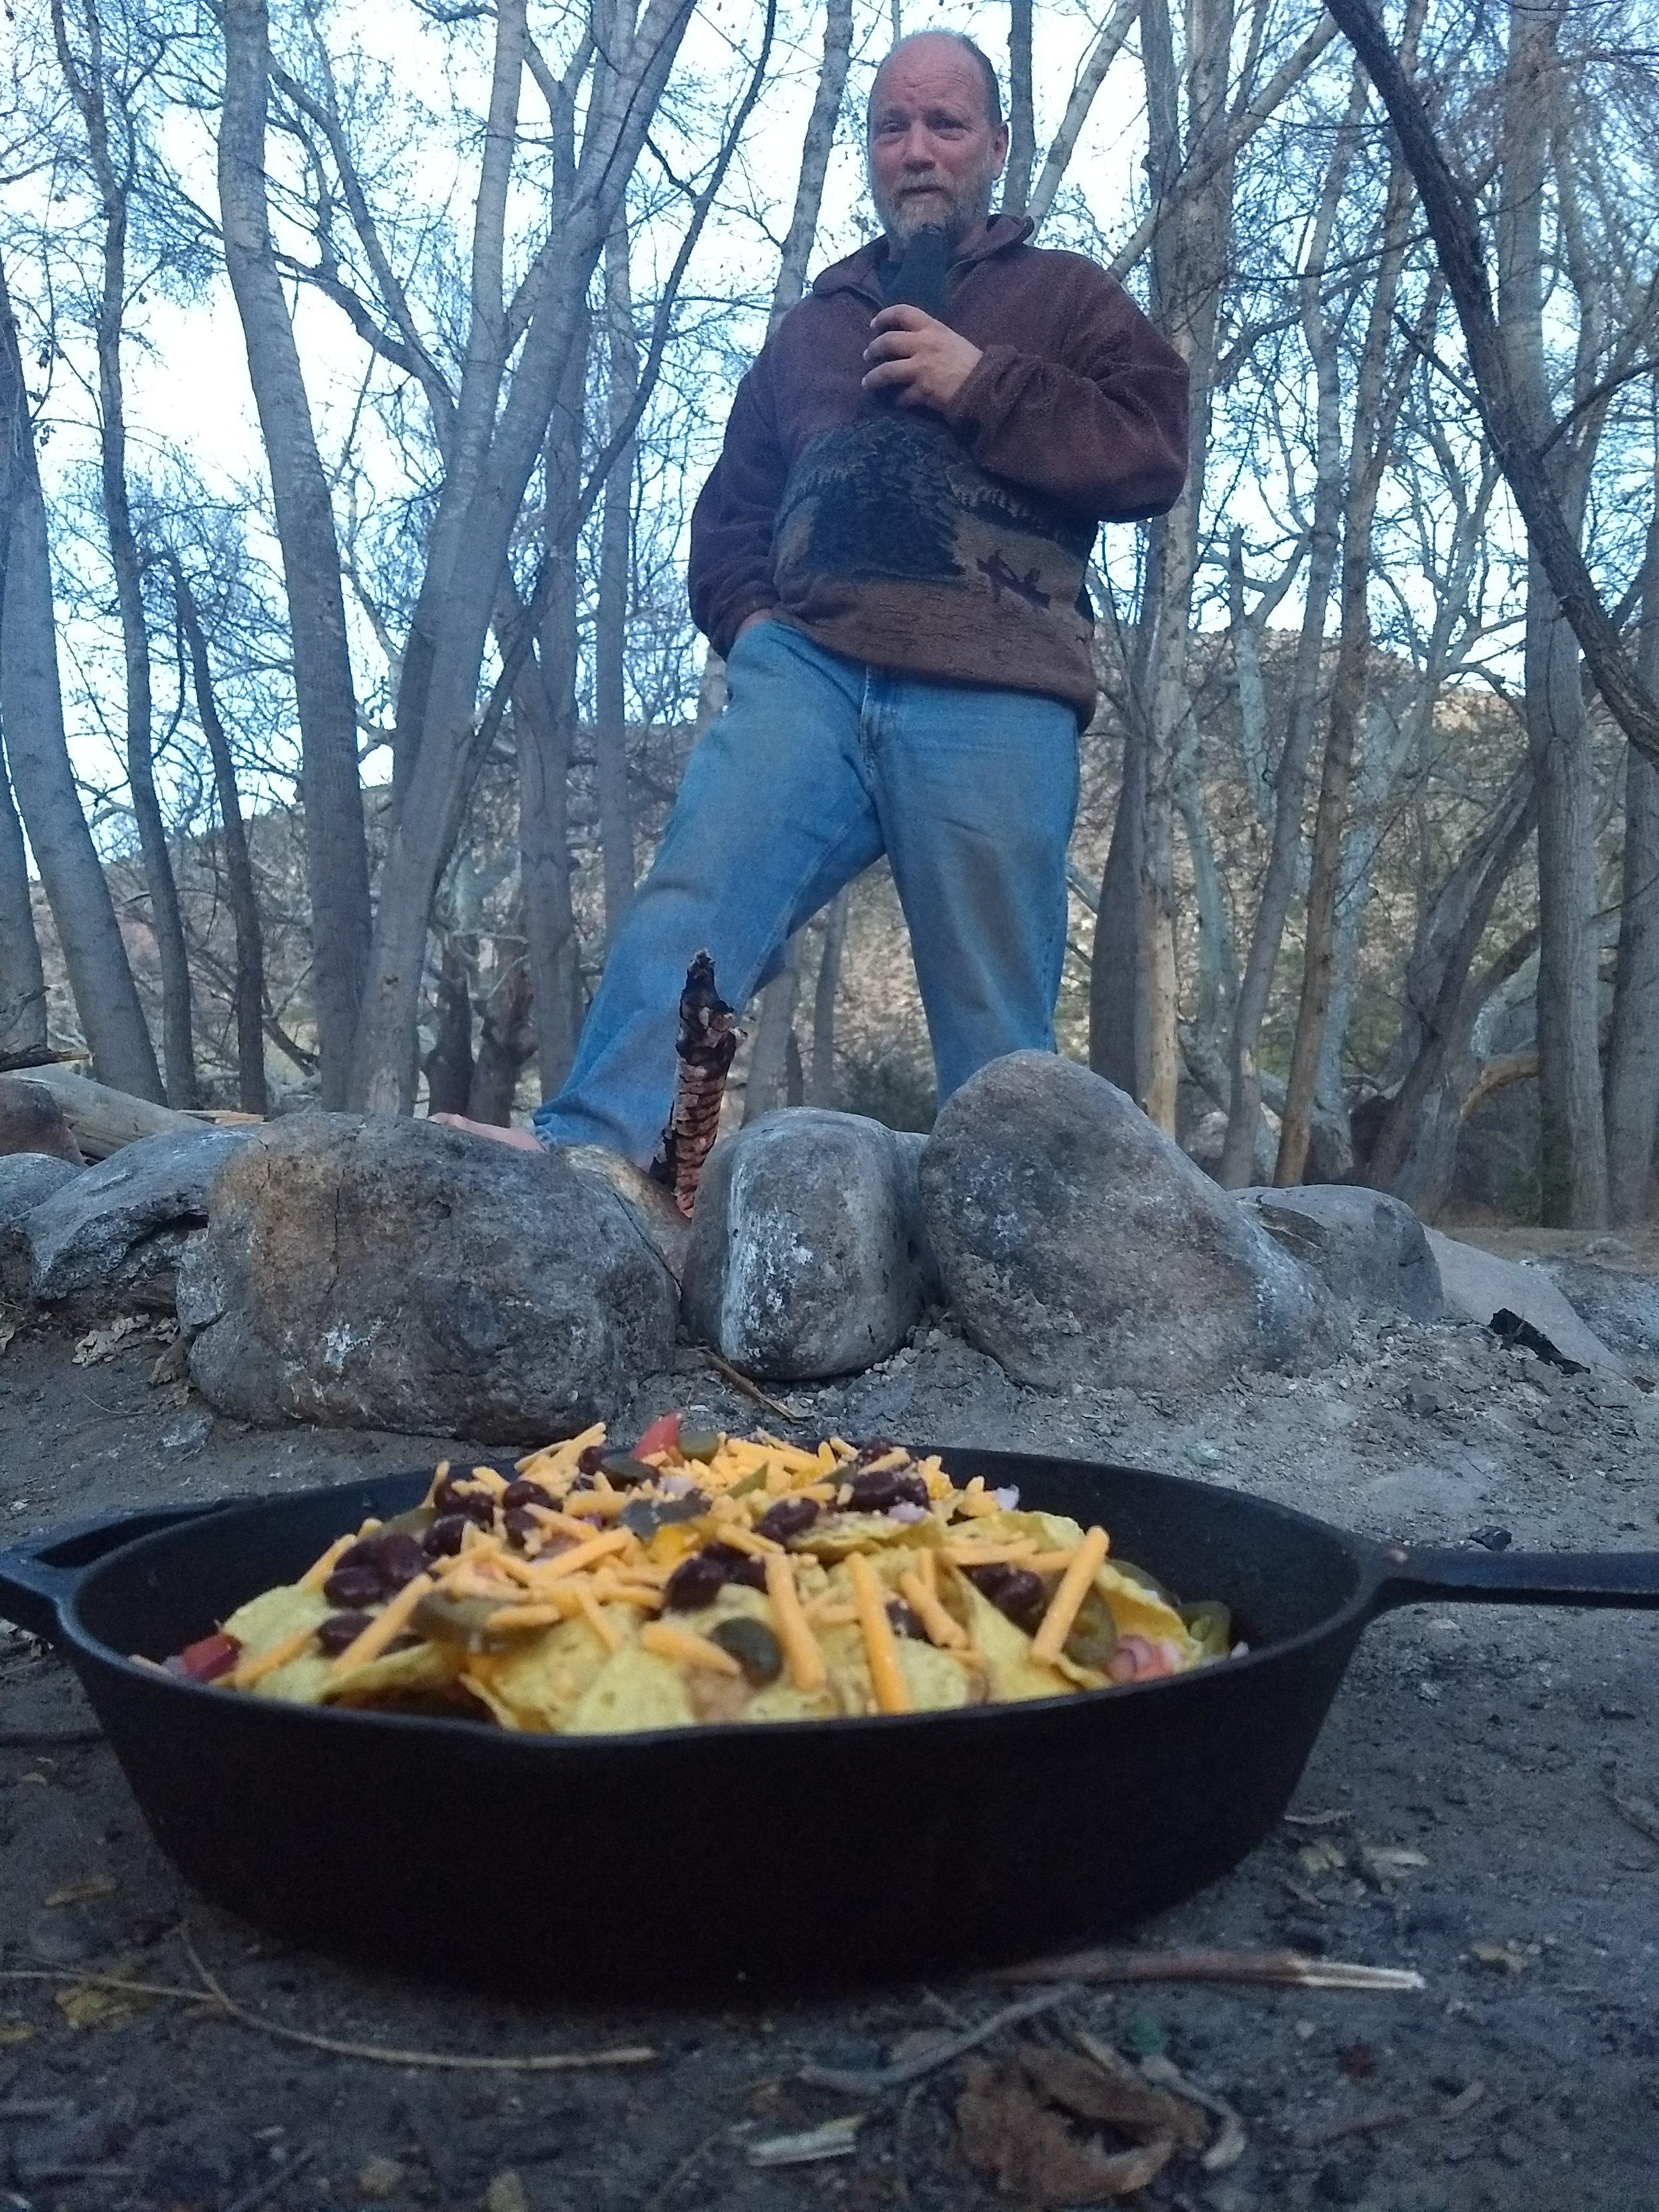 Our main man, Greg, patiently awaiting campfire nachos at Brock Canyon.